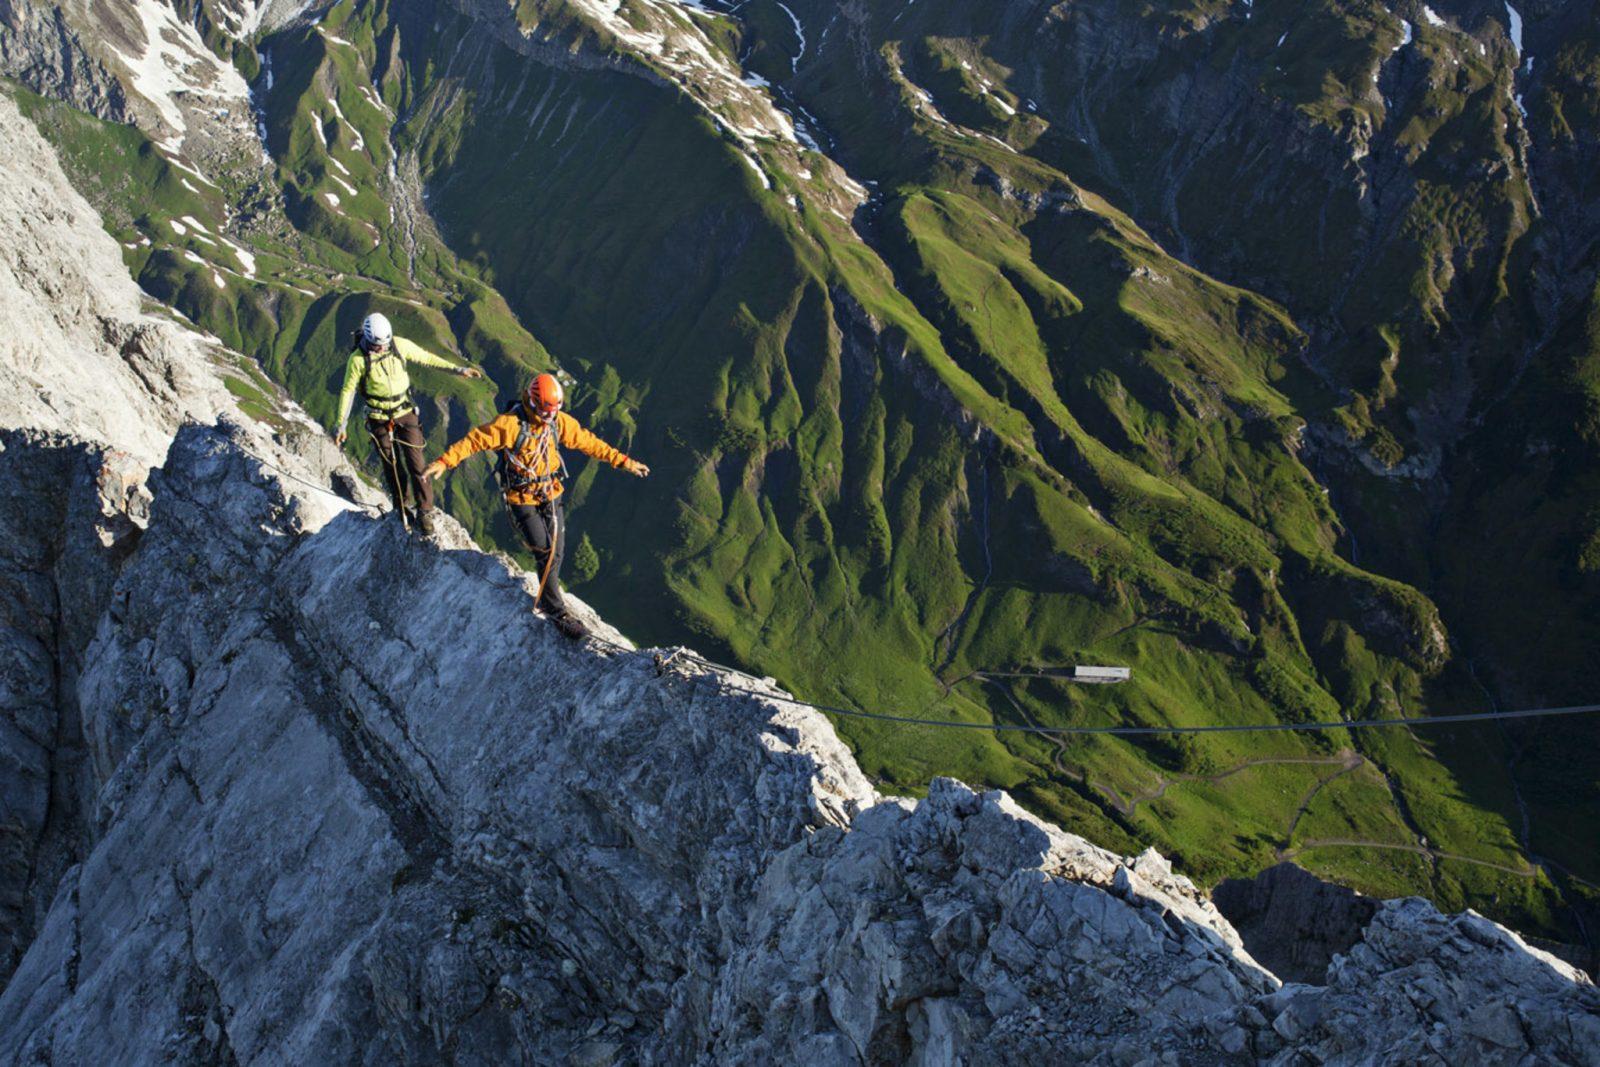 Die mit dem Grat tanzen: Unterwegs am Arlberger Klettersteig. Foto: Bernd Ritschel / TVB St. Anton am Arlberg | Climbers Paradise